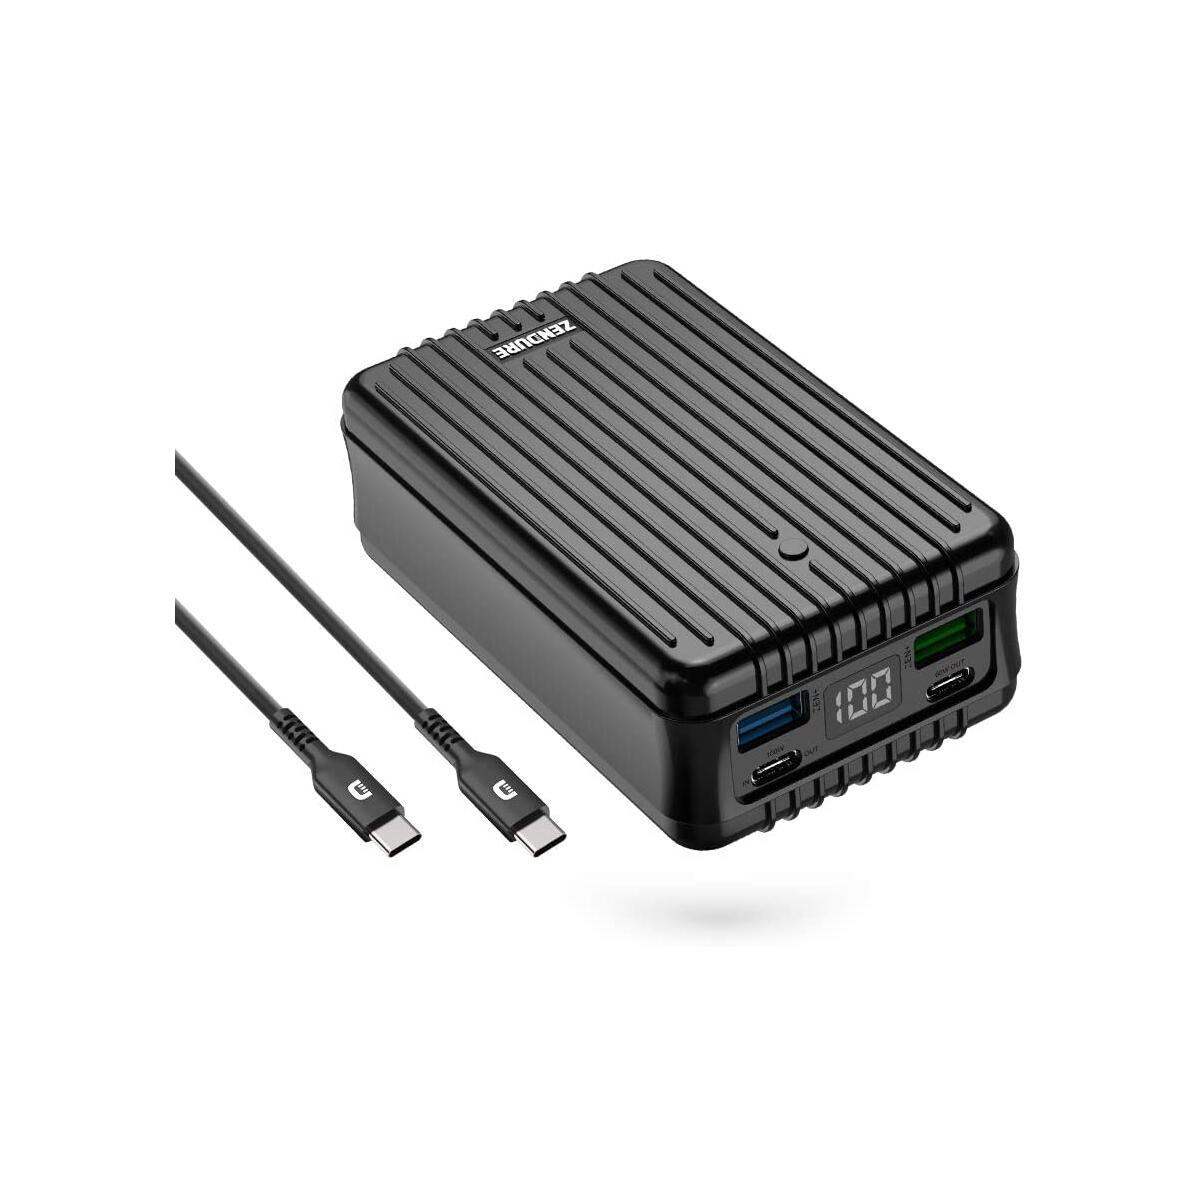 Zendure Power Bank, SuperTank 27,000mAh External Battery with Dual USB-C PD (100W&60W) and USB-A (15W&18W), QC 3.0 Portable Charger for USB-C laptops, MacBook, iPad Pro, Switch, etc.-Black